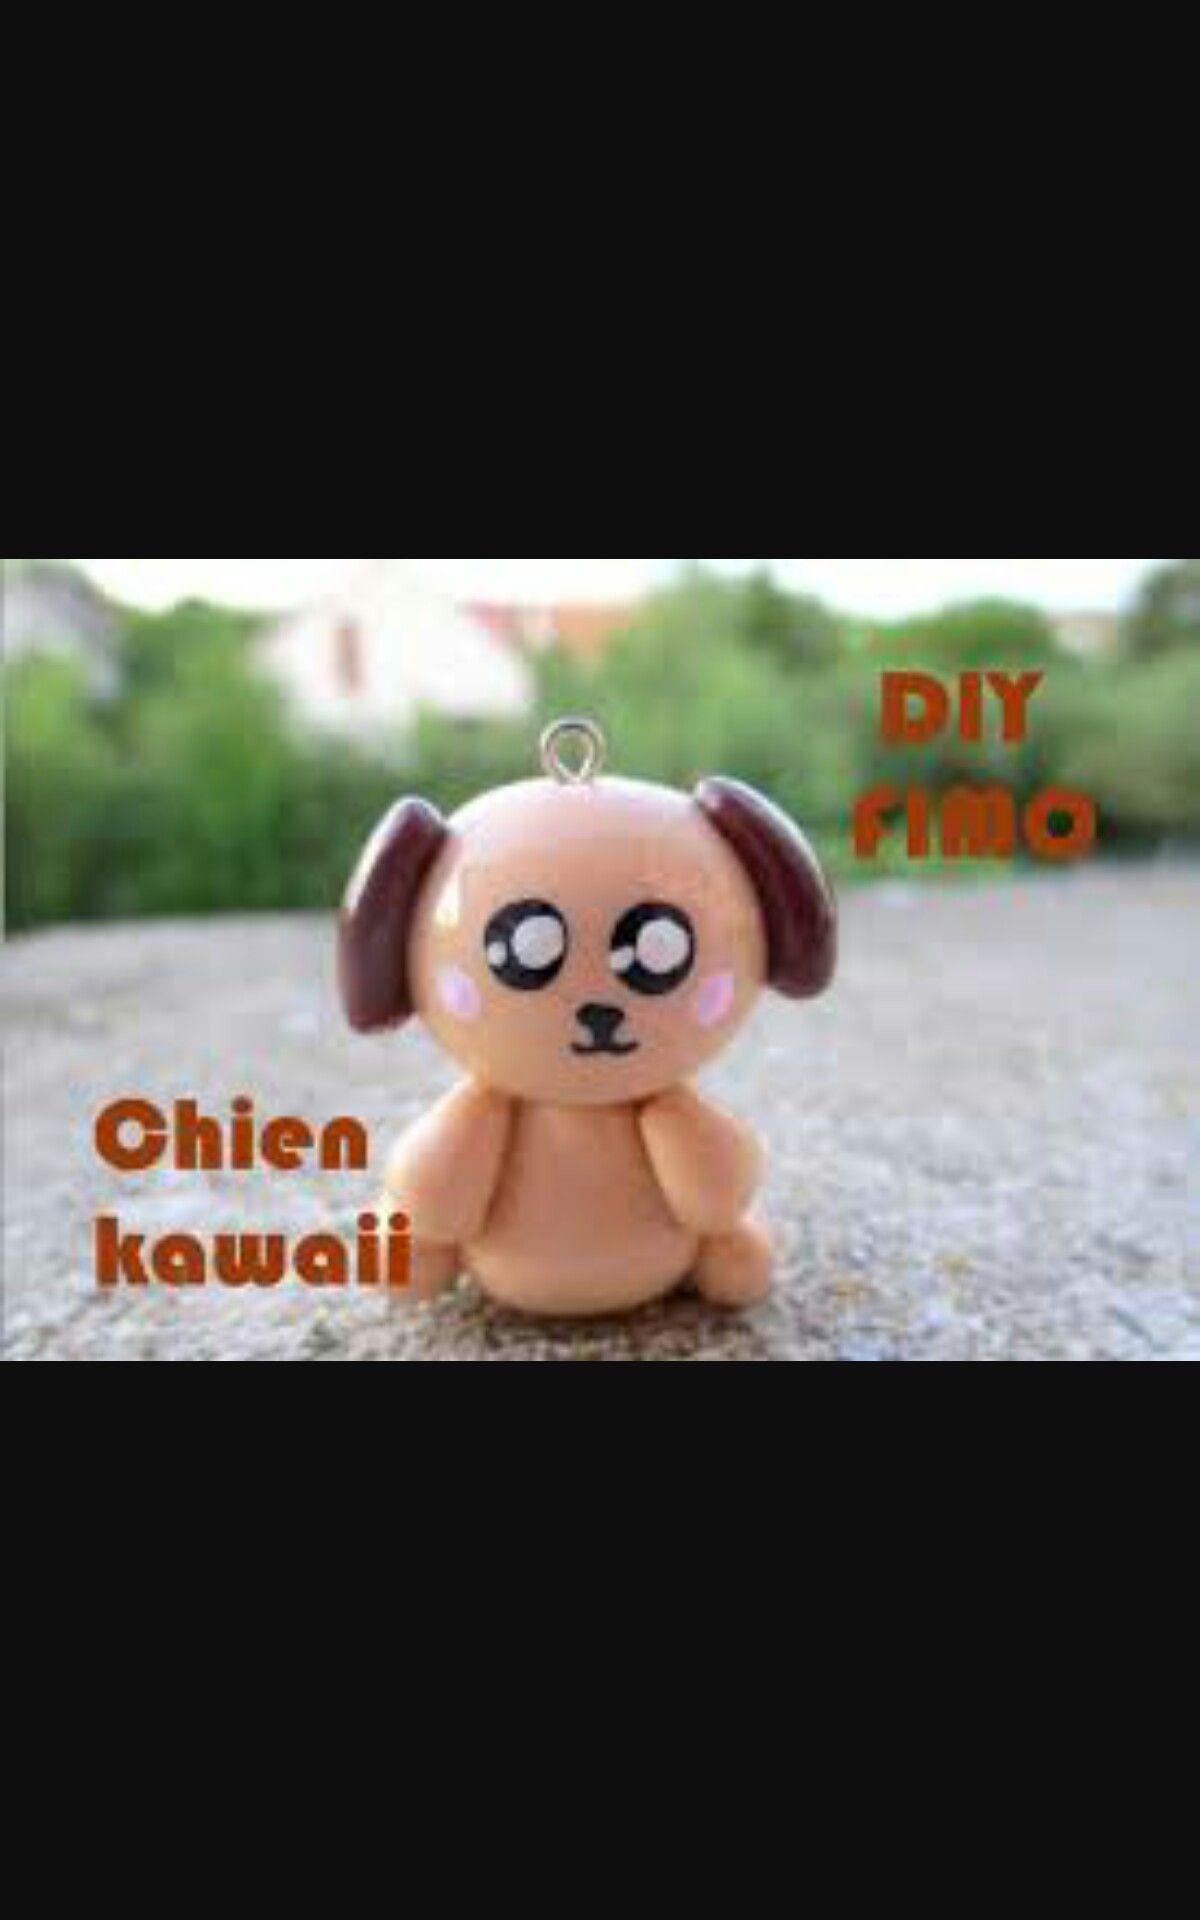 Chien kawaii